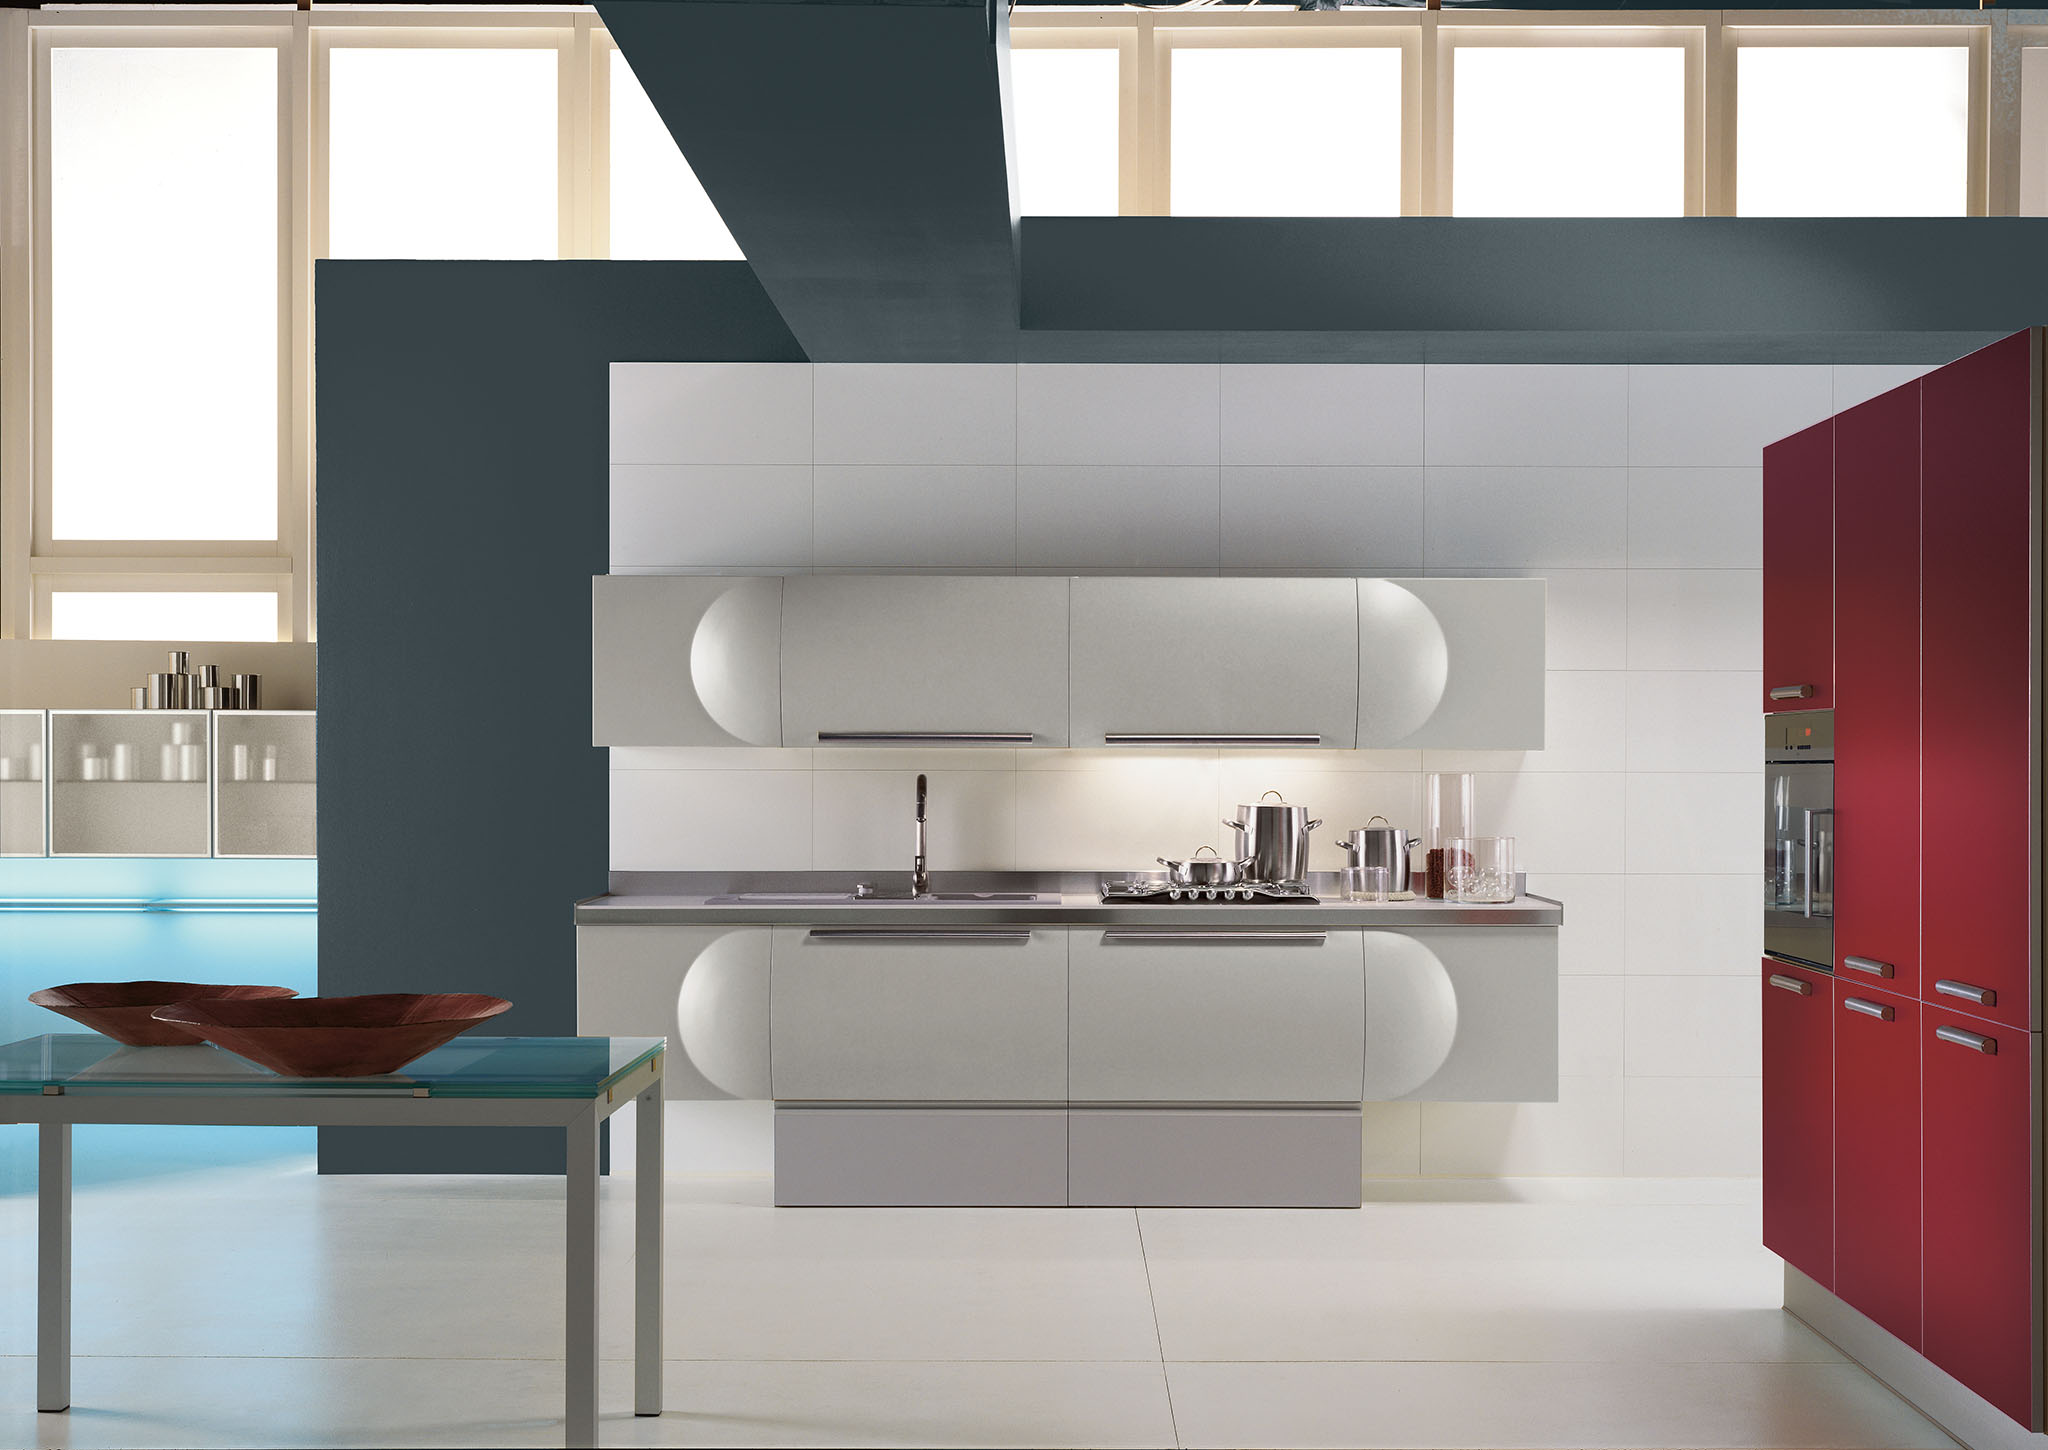 Disegno luci bagno - Cucine in muratura bianche ...